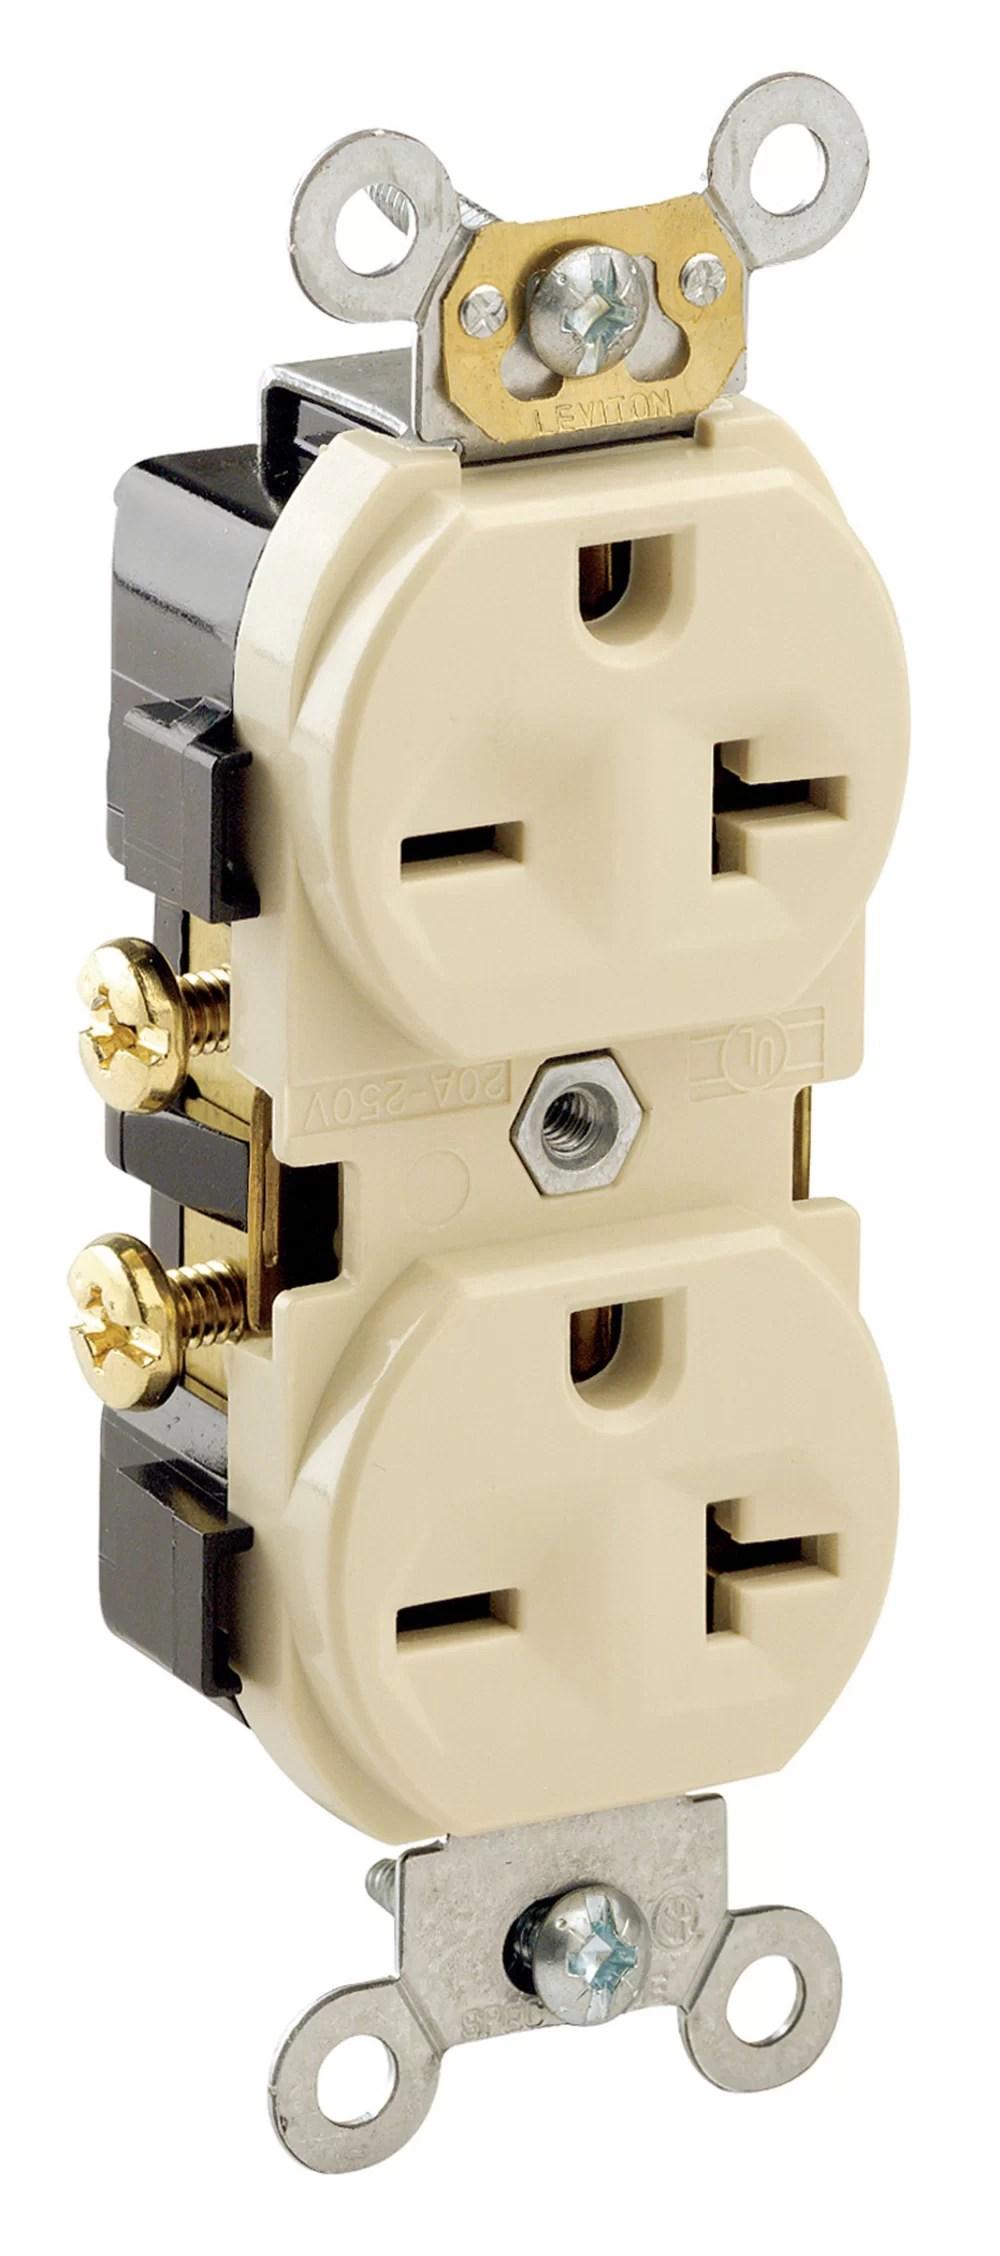 medium resolution of 051 05822 00i 20 amp gfci duplex outlet